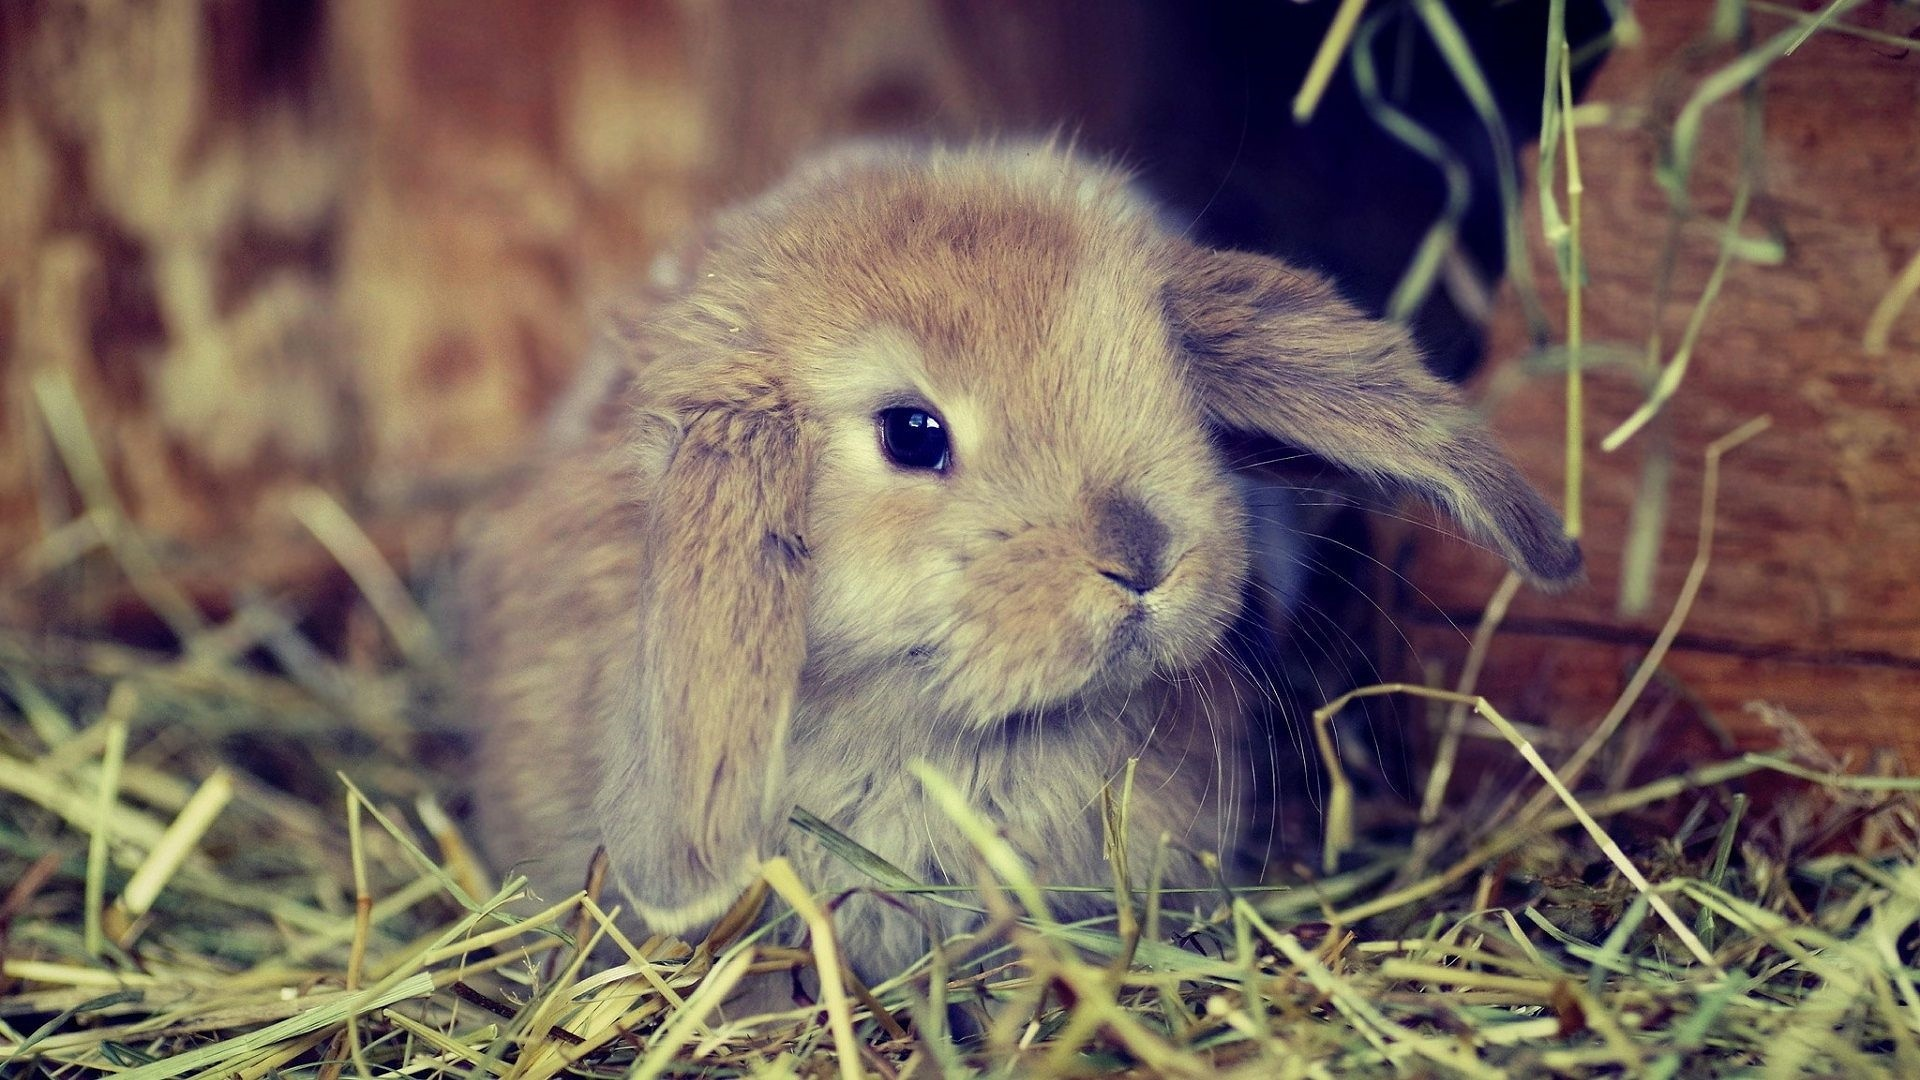 Cute Rabbit Picture